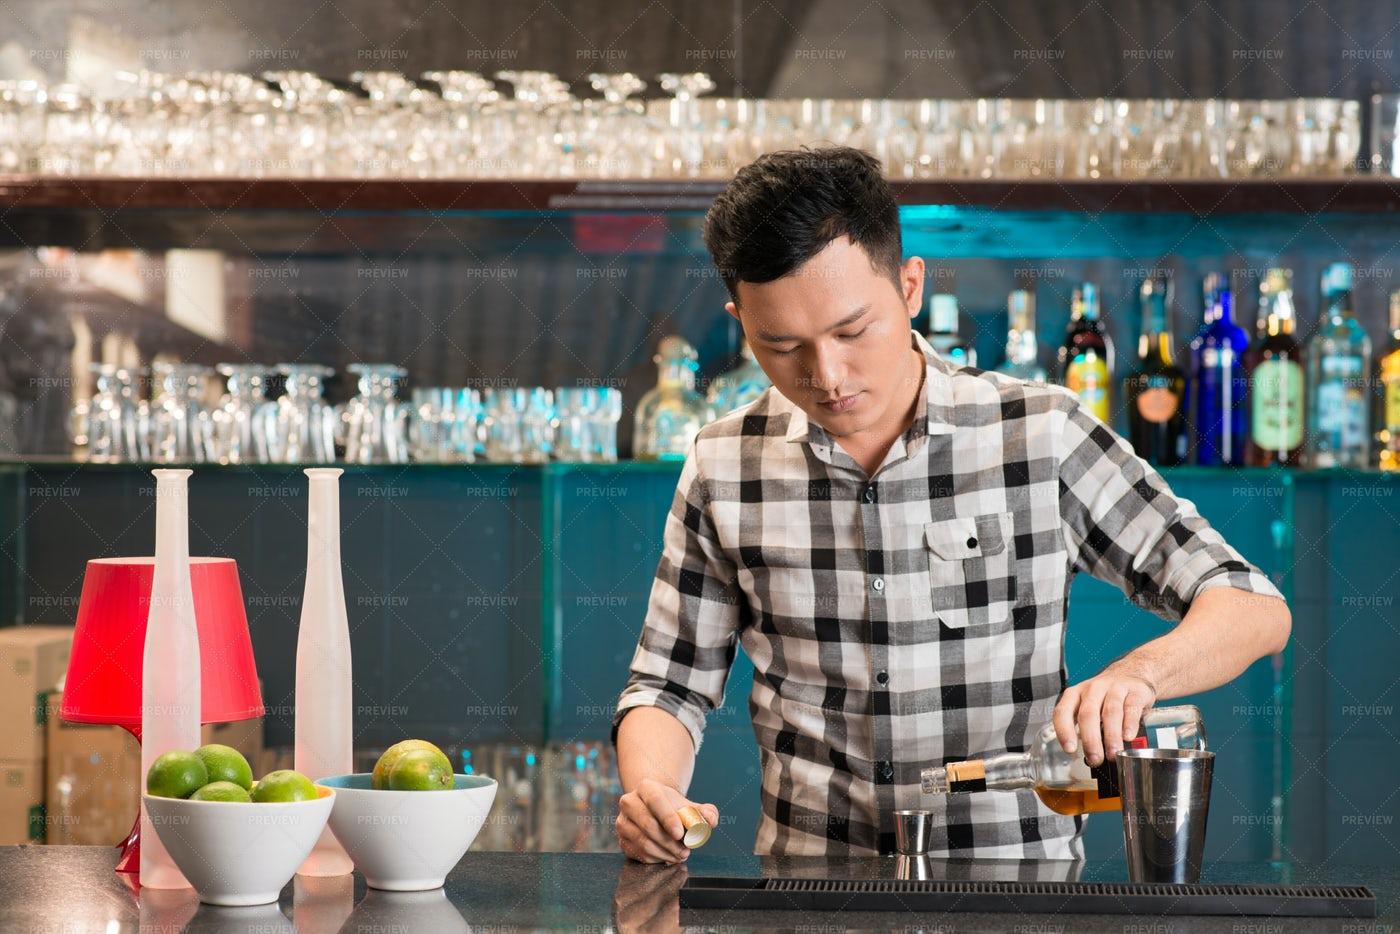 Preofessional Bartender: Stock Photos